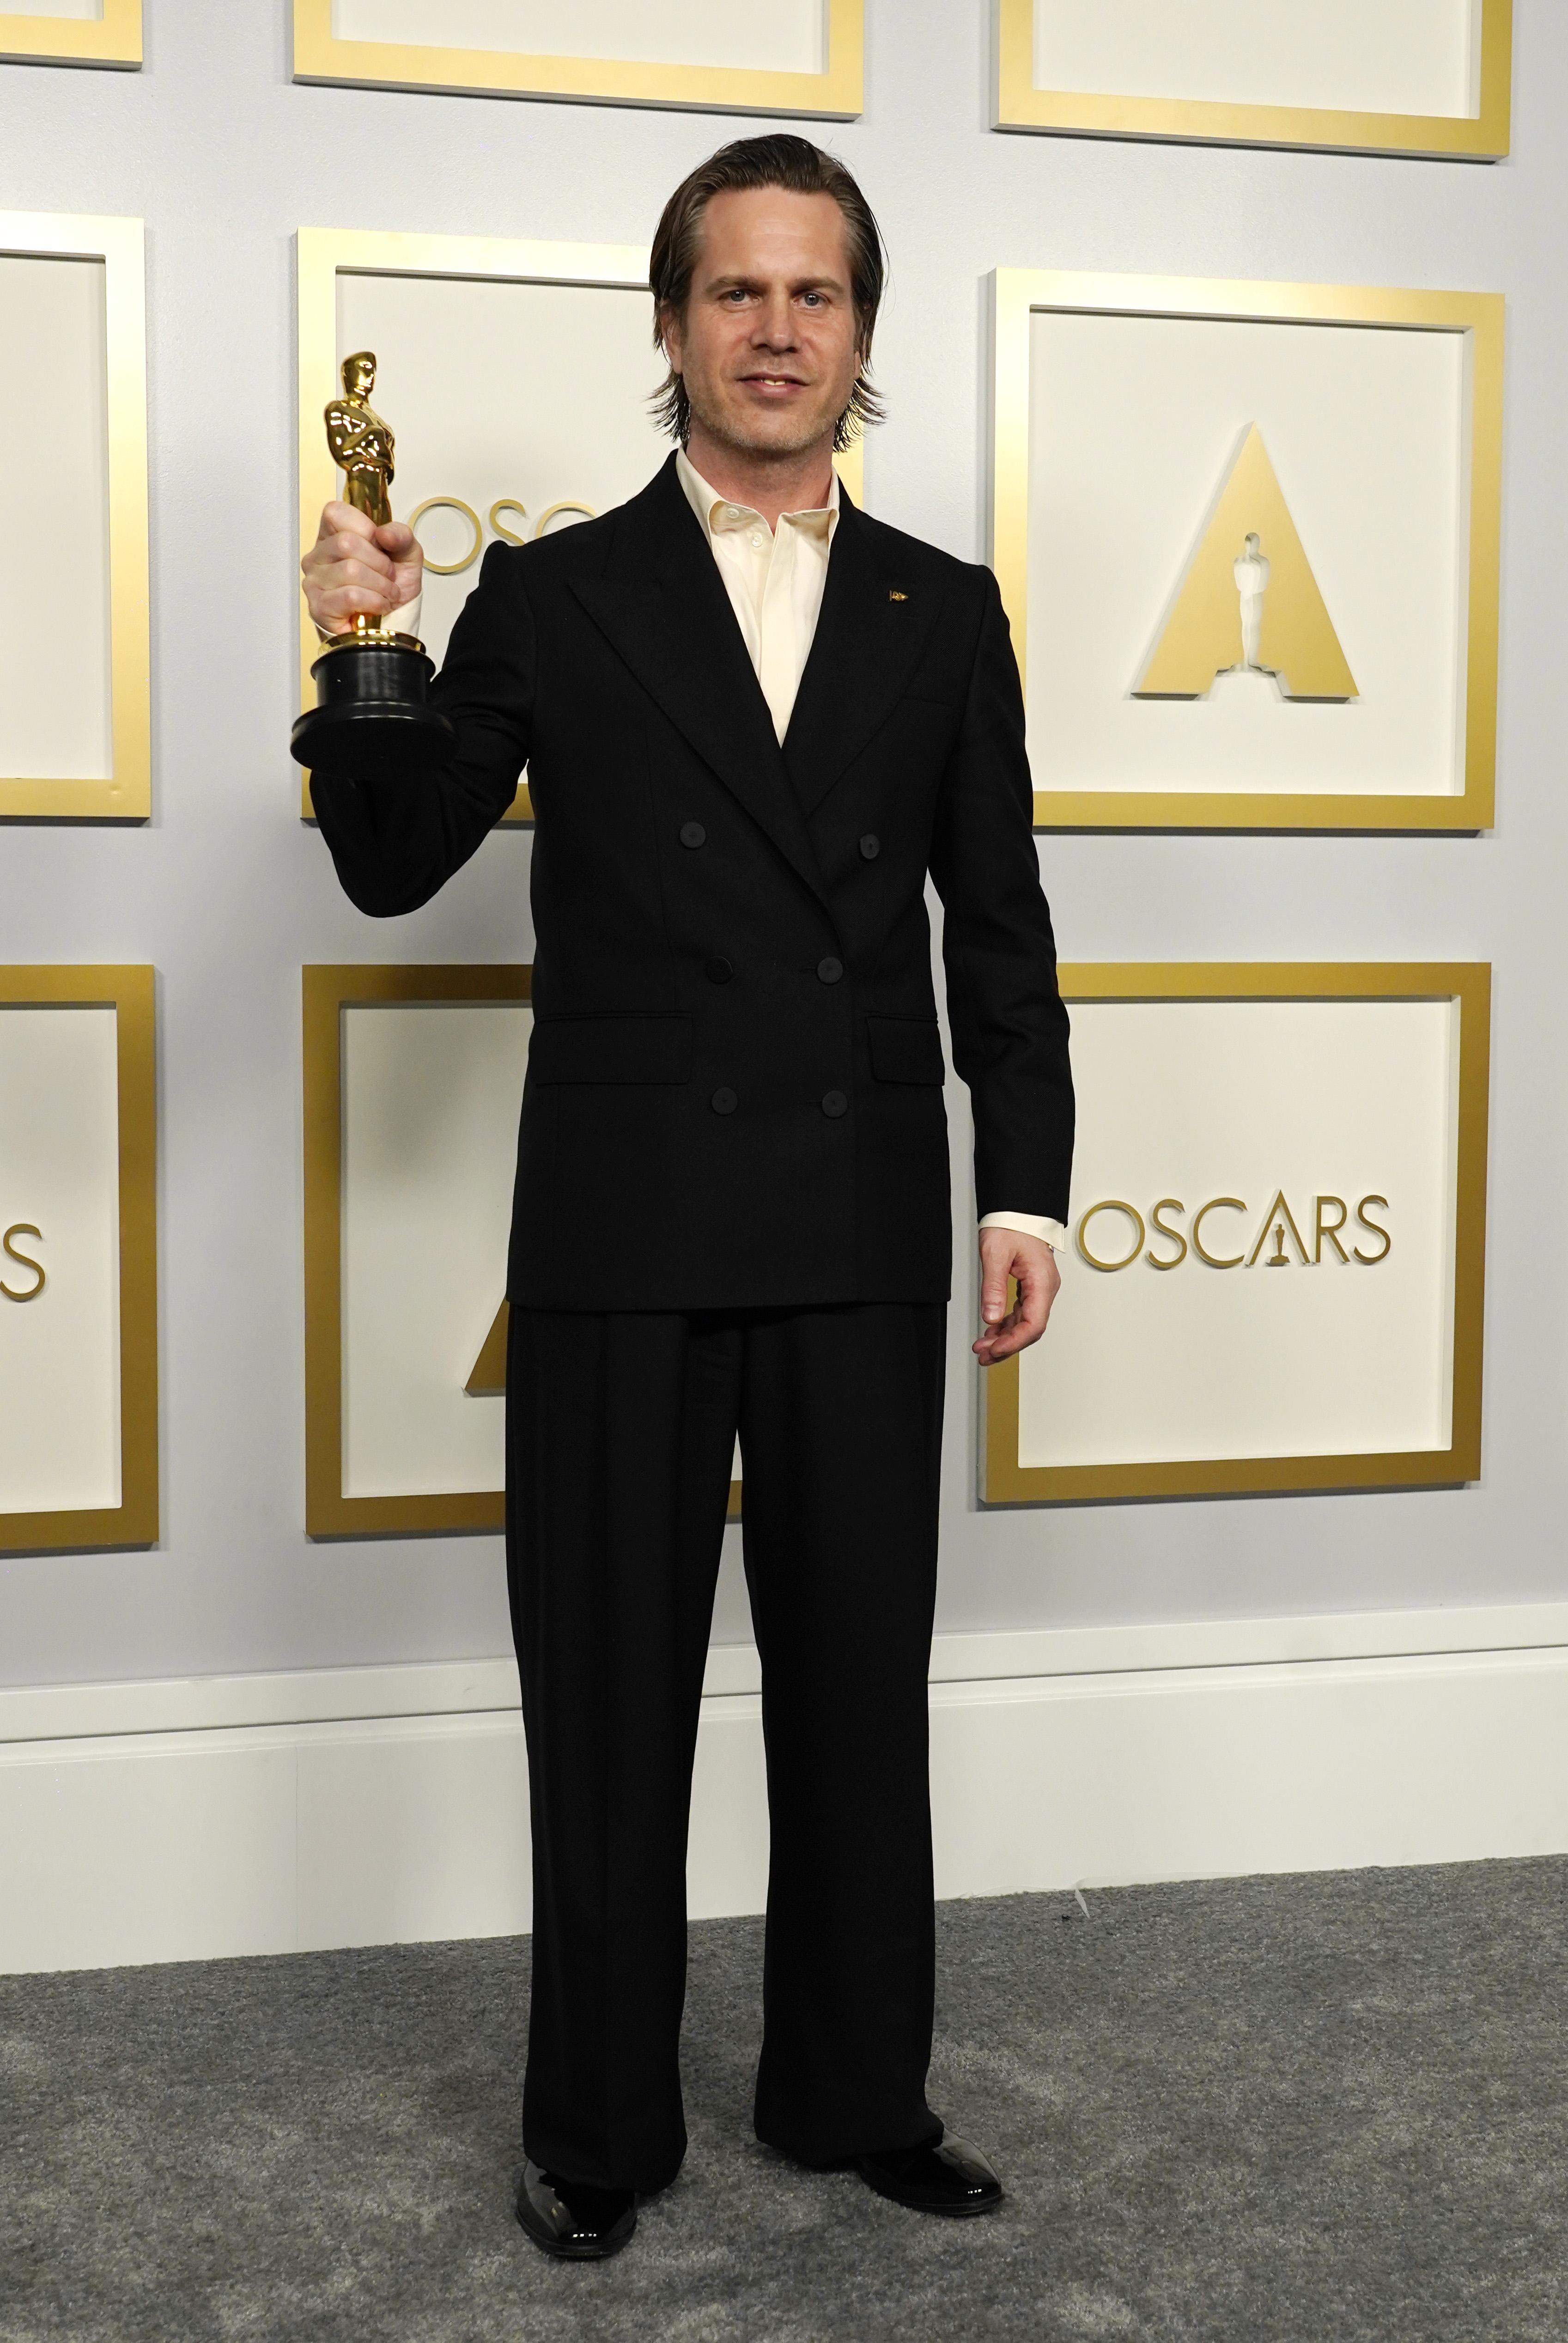 Mikkel E.G. Nielsen at an event for The 93rd Oscars (2021)